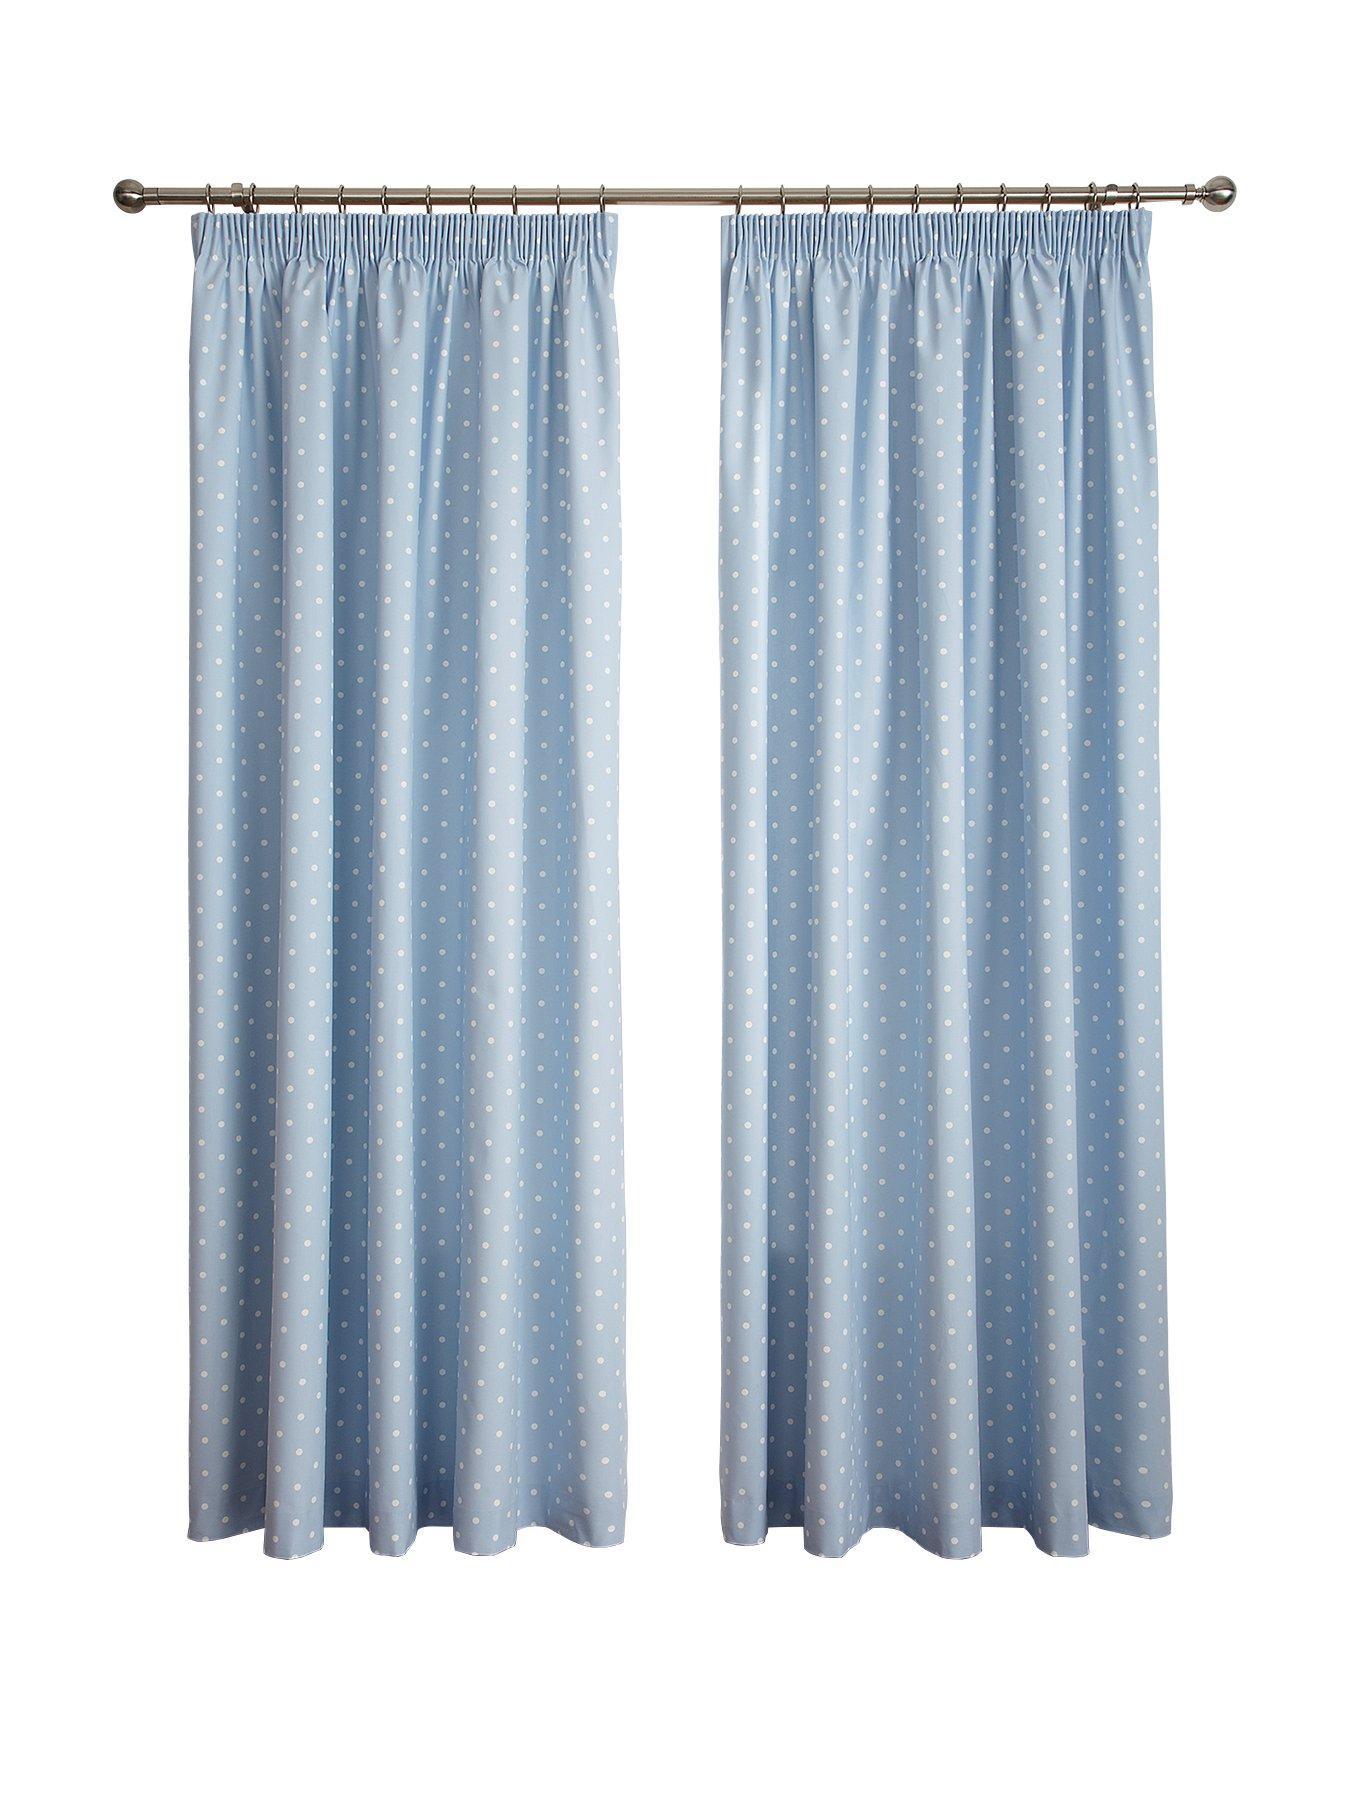 Blue Curtains Curtains U0026 Blinds Home U0026 Garden Very ...